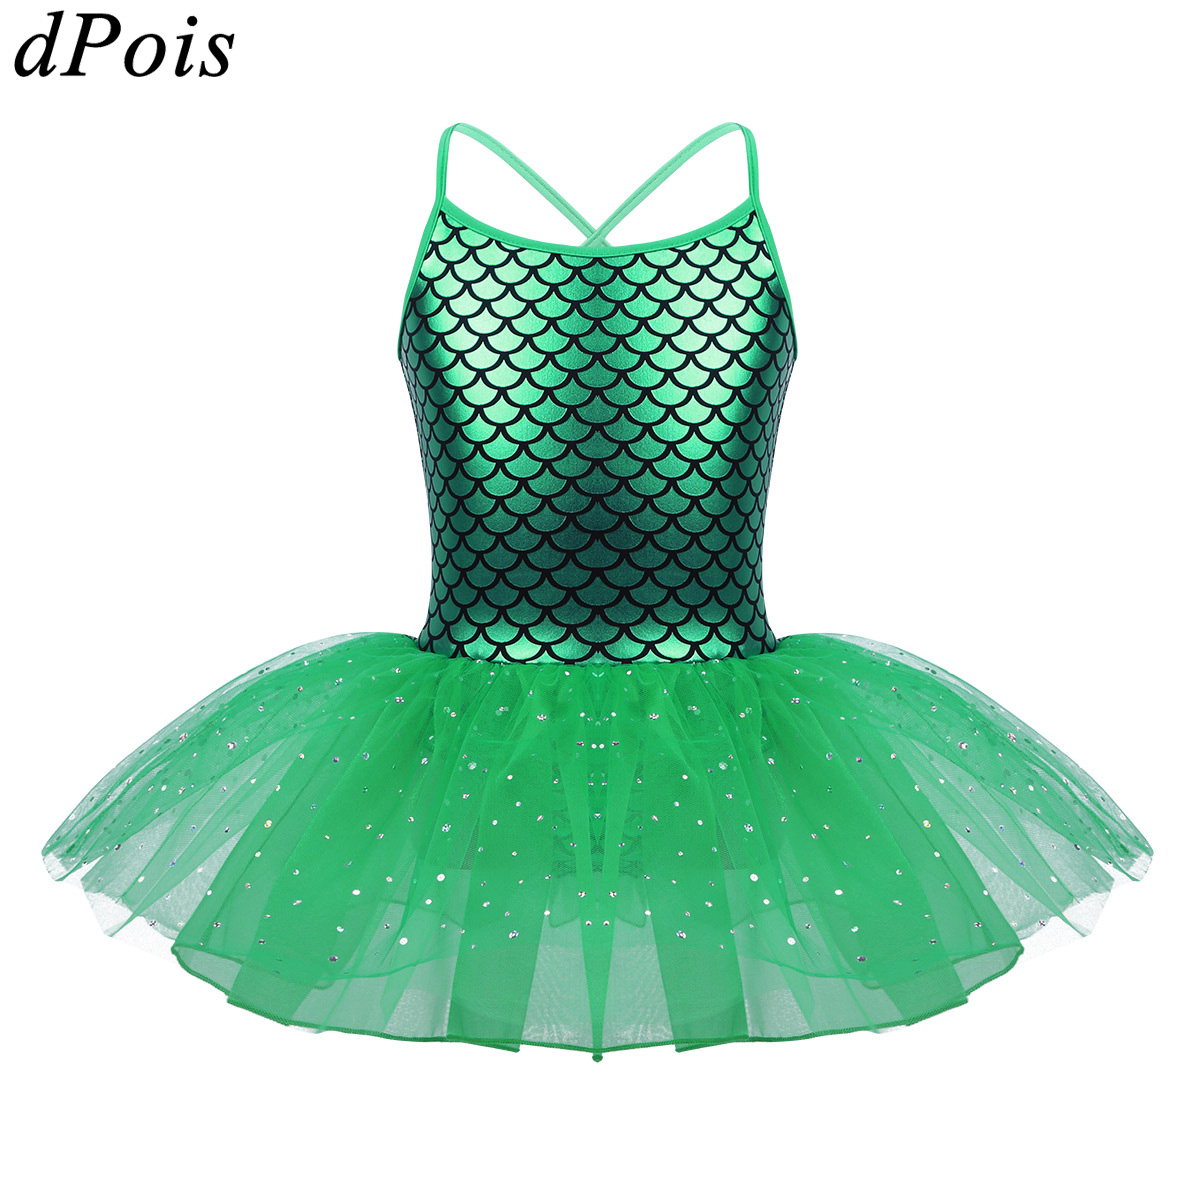 Child Girls Ballet Tutu Dance Dress Gymnastics Leotard Mermaid Dancewear Costume